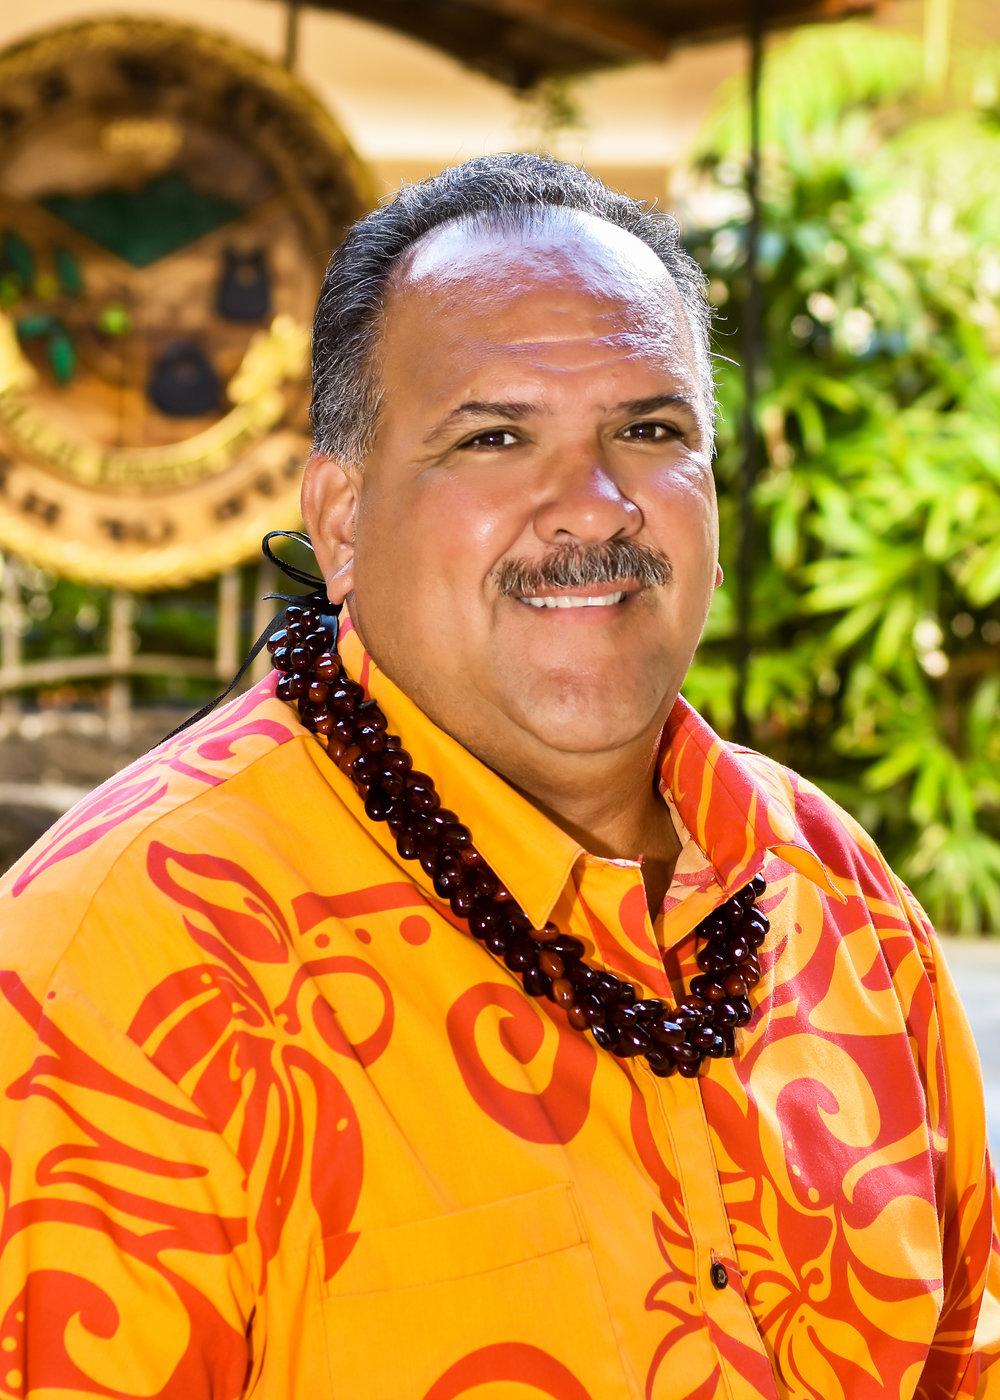 """This is an opportunity for the keiki on Kauai to tell their stories, and Kauai has lots of stories to tell.""      Bernard Carvalho Jr.- Mayor of the County of Kauai & Niihau"